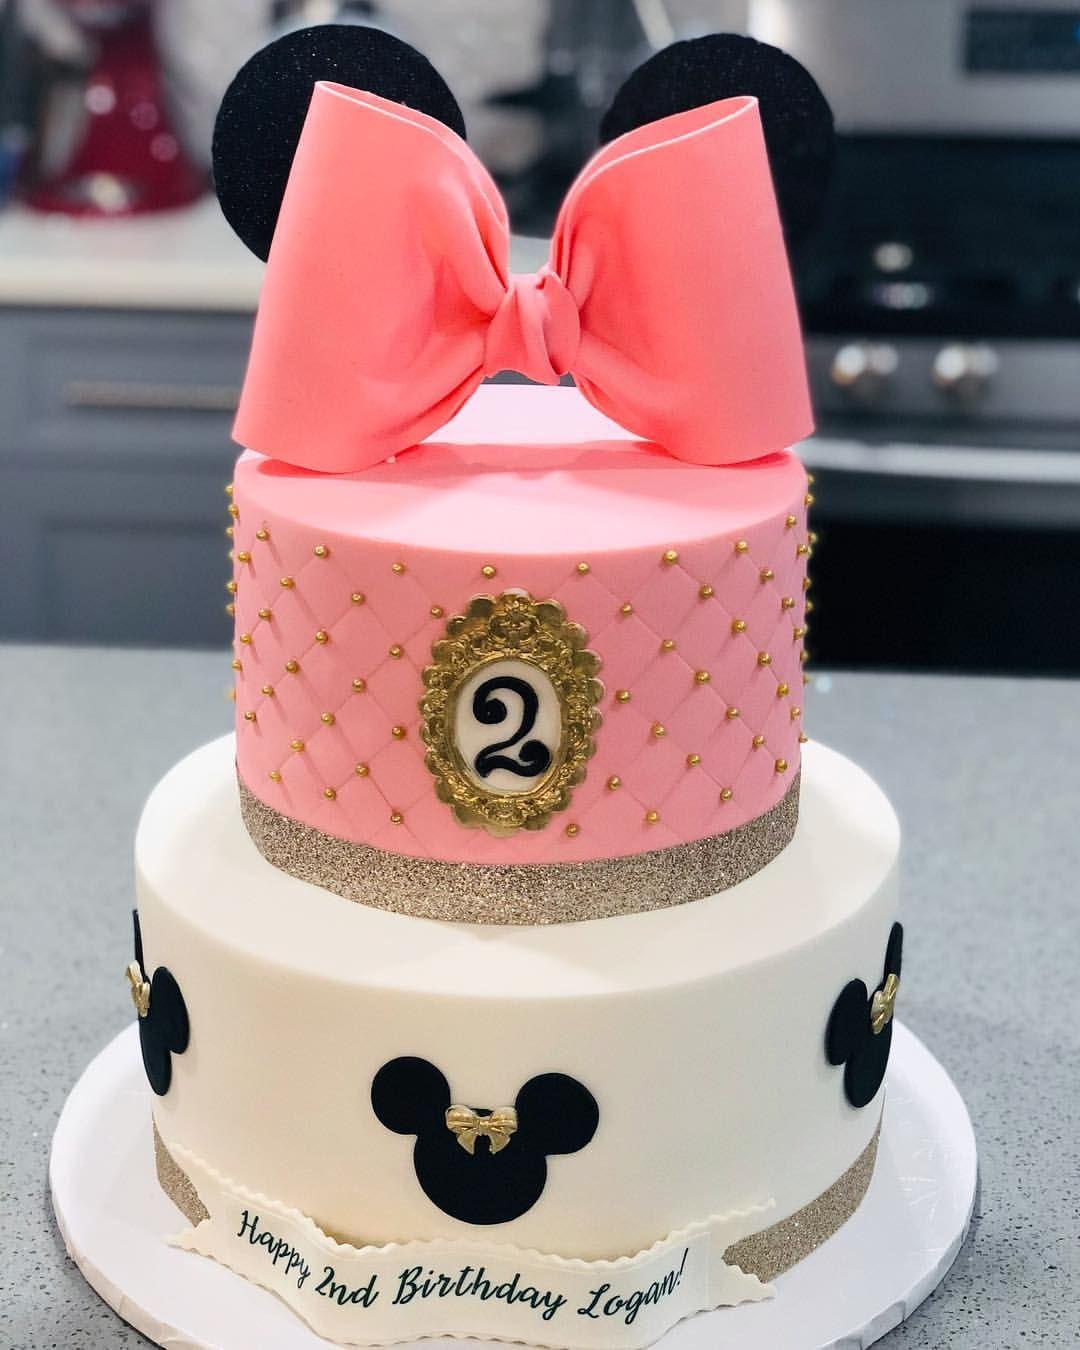 Plush Printed Dress Minnie Mouse Birthday Cakes Minnie Mouse Cake Design Minnie Mouse Birthday Party